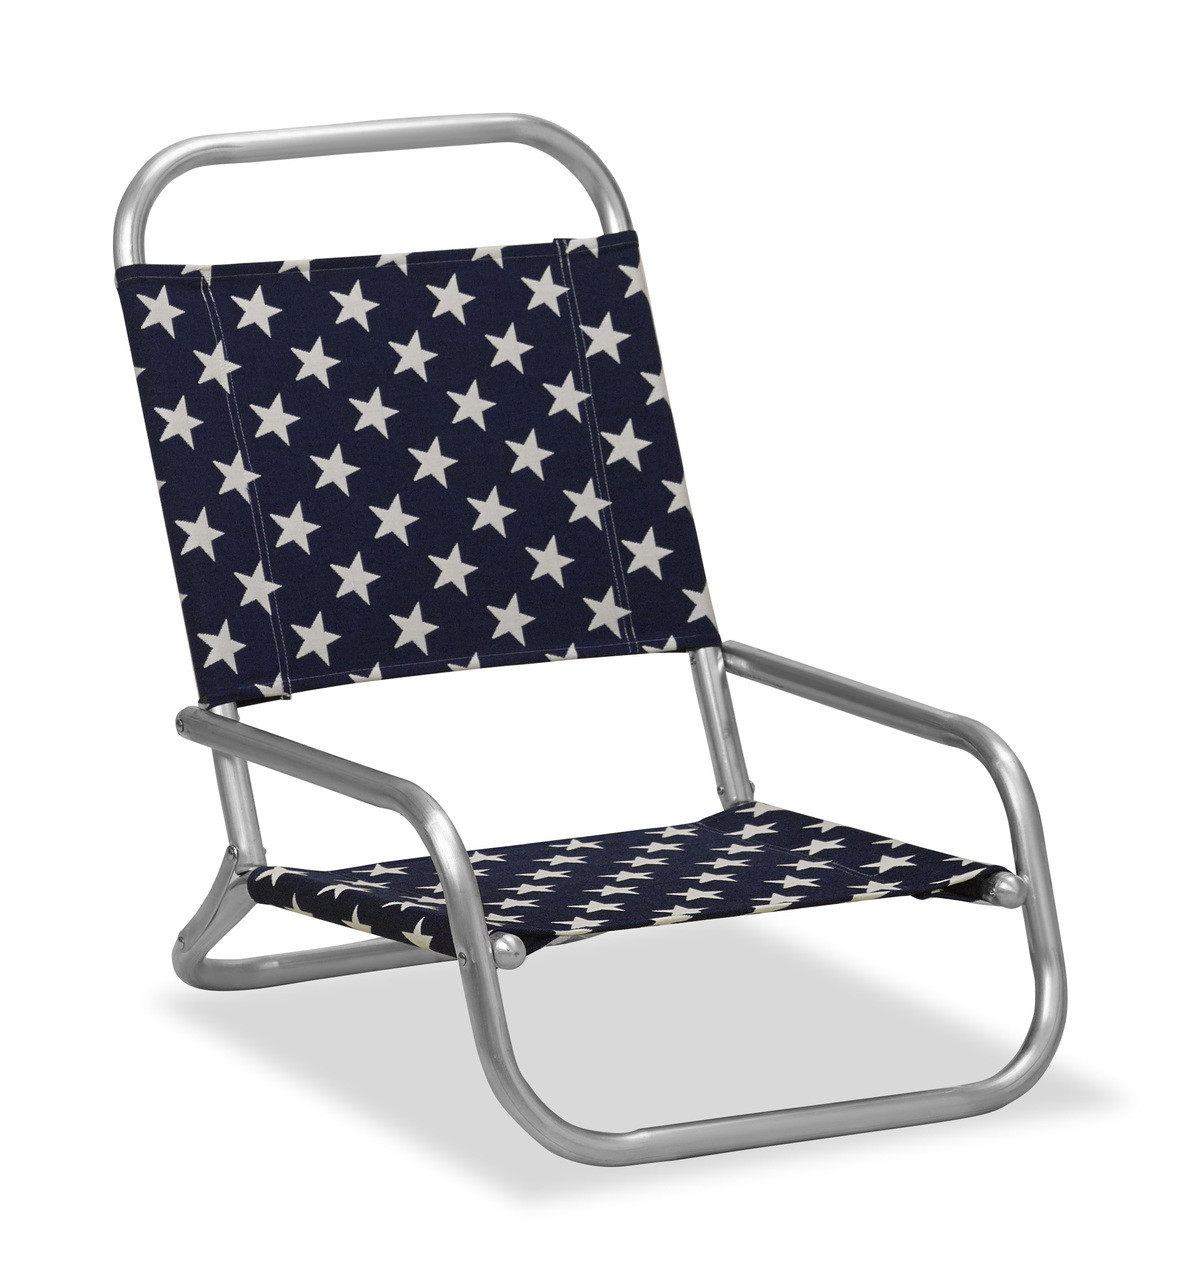 bdf026a9d30c Telescope Casual Sun and Sand Beach Chair - Wholesale Pricing